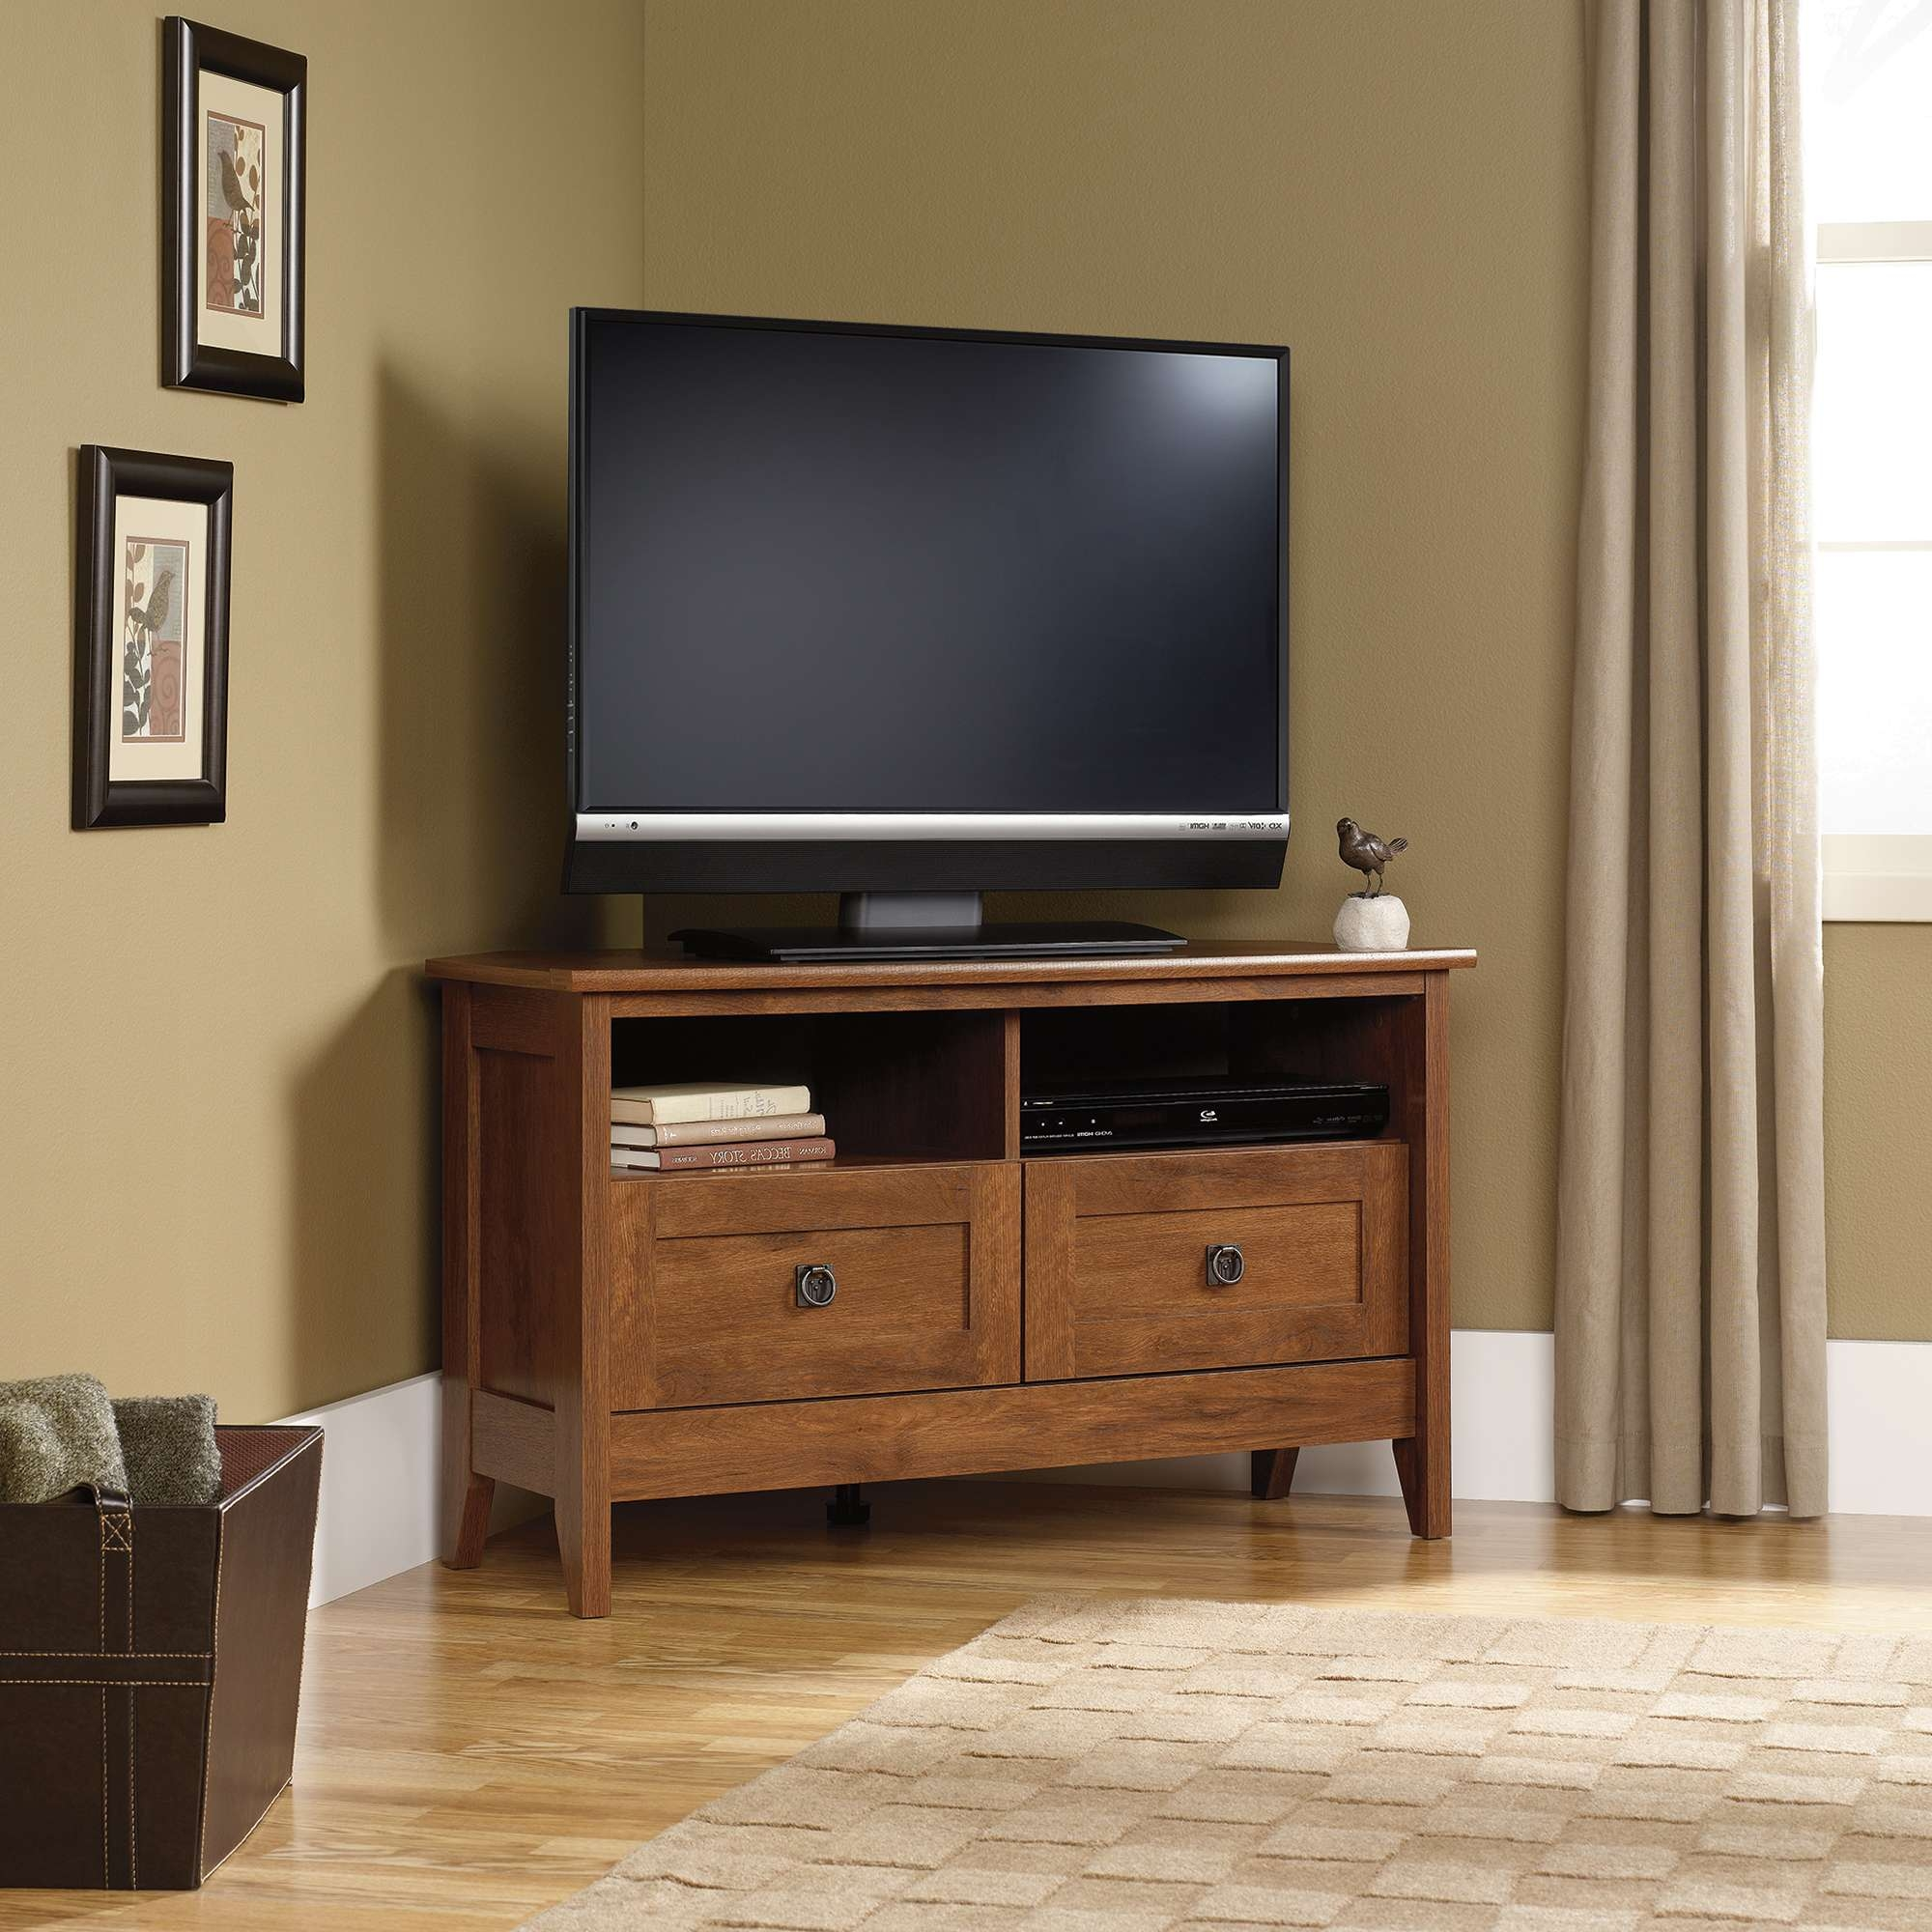 Sauder Select | Corner Tv Stand | 410627 | Sauder For Corner Tv Stands (View 5 of 15)